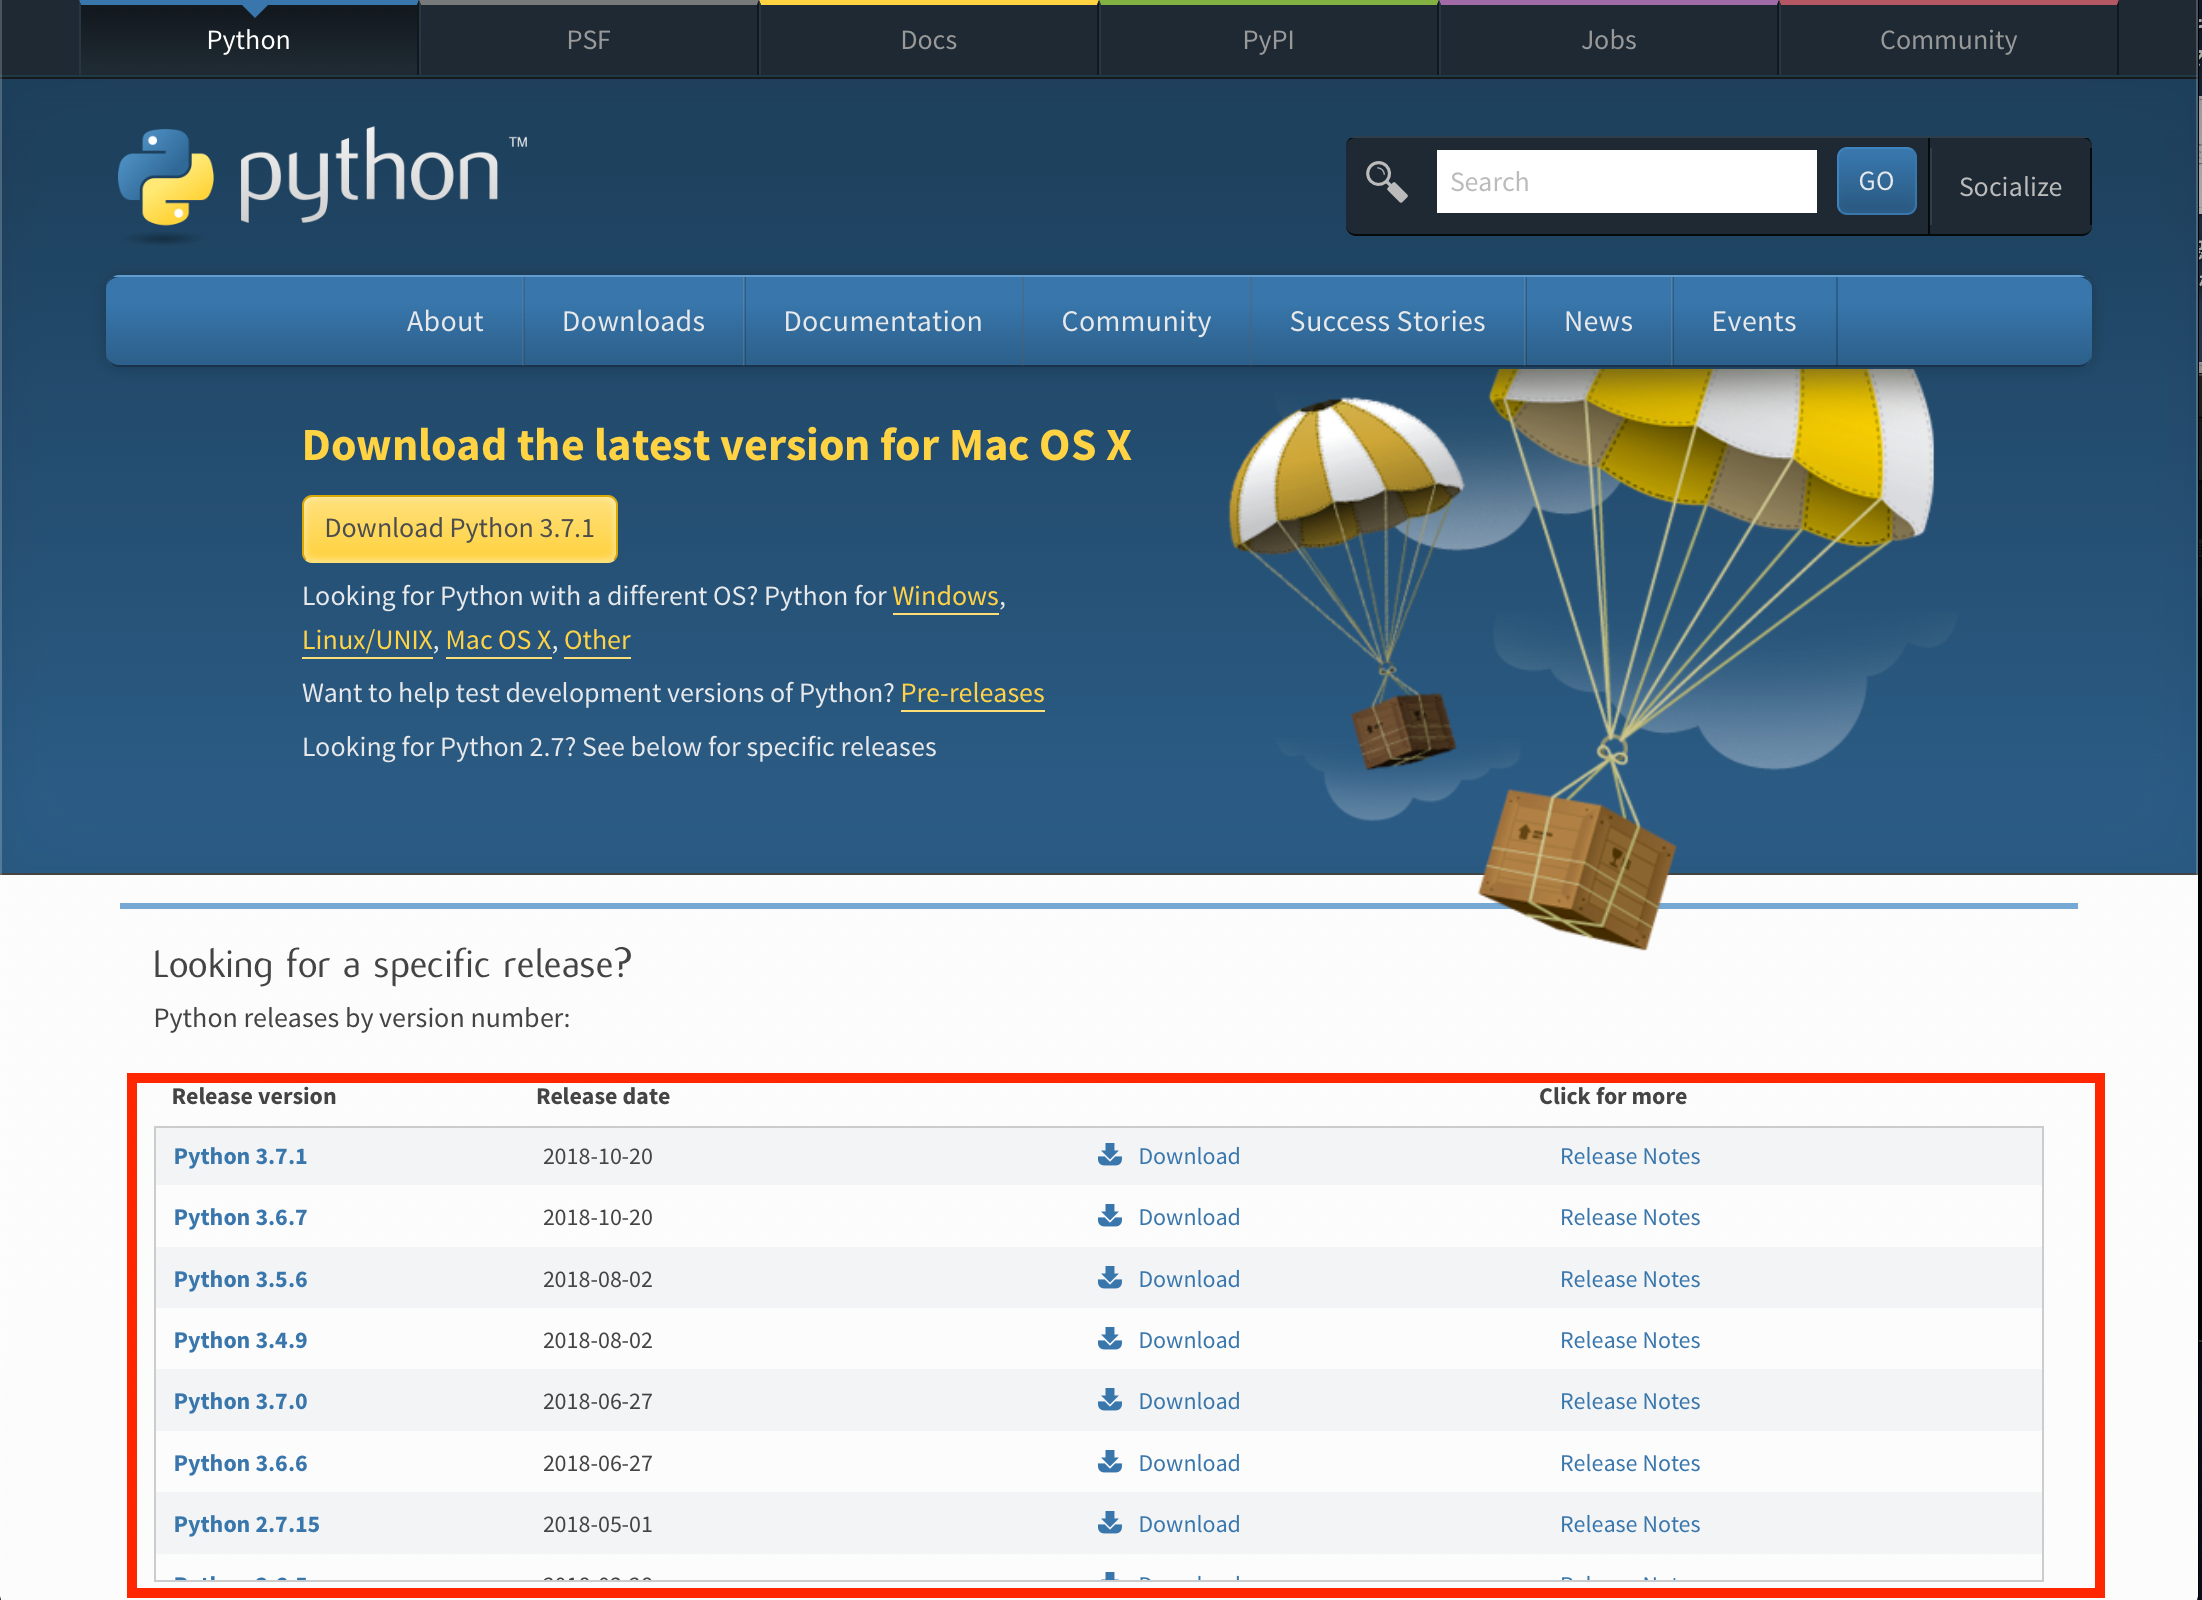 Python_org.png